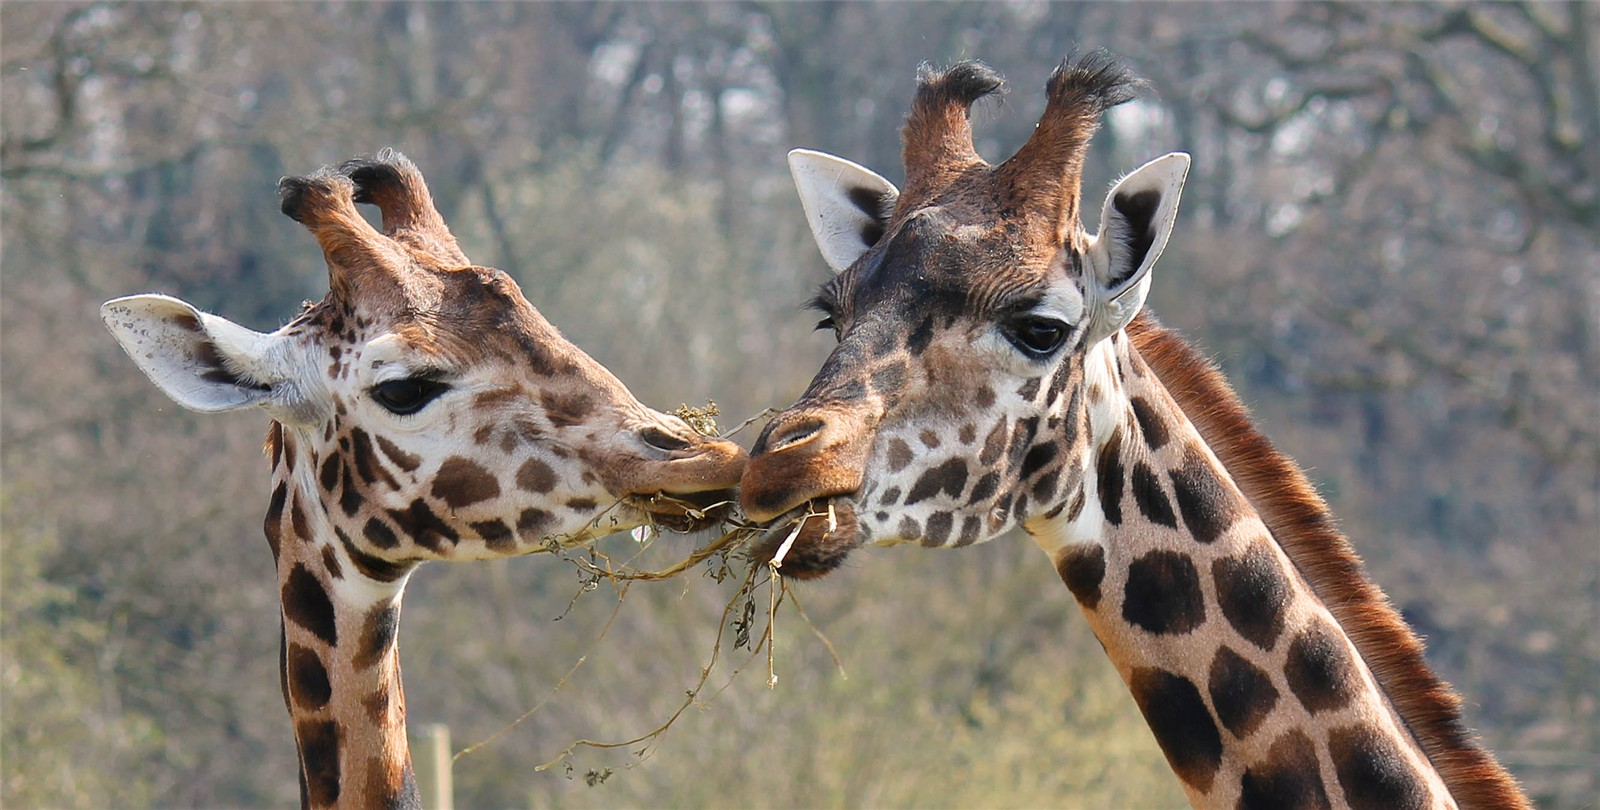 Giraffe Giraffa Camelopardalis Marwell Zoo Dinner For Two Sam Sampson